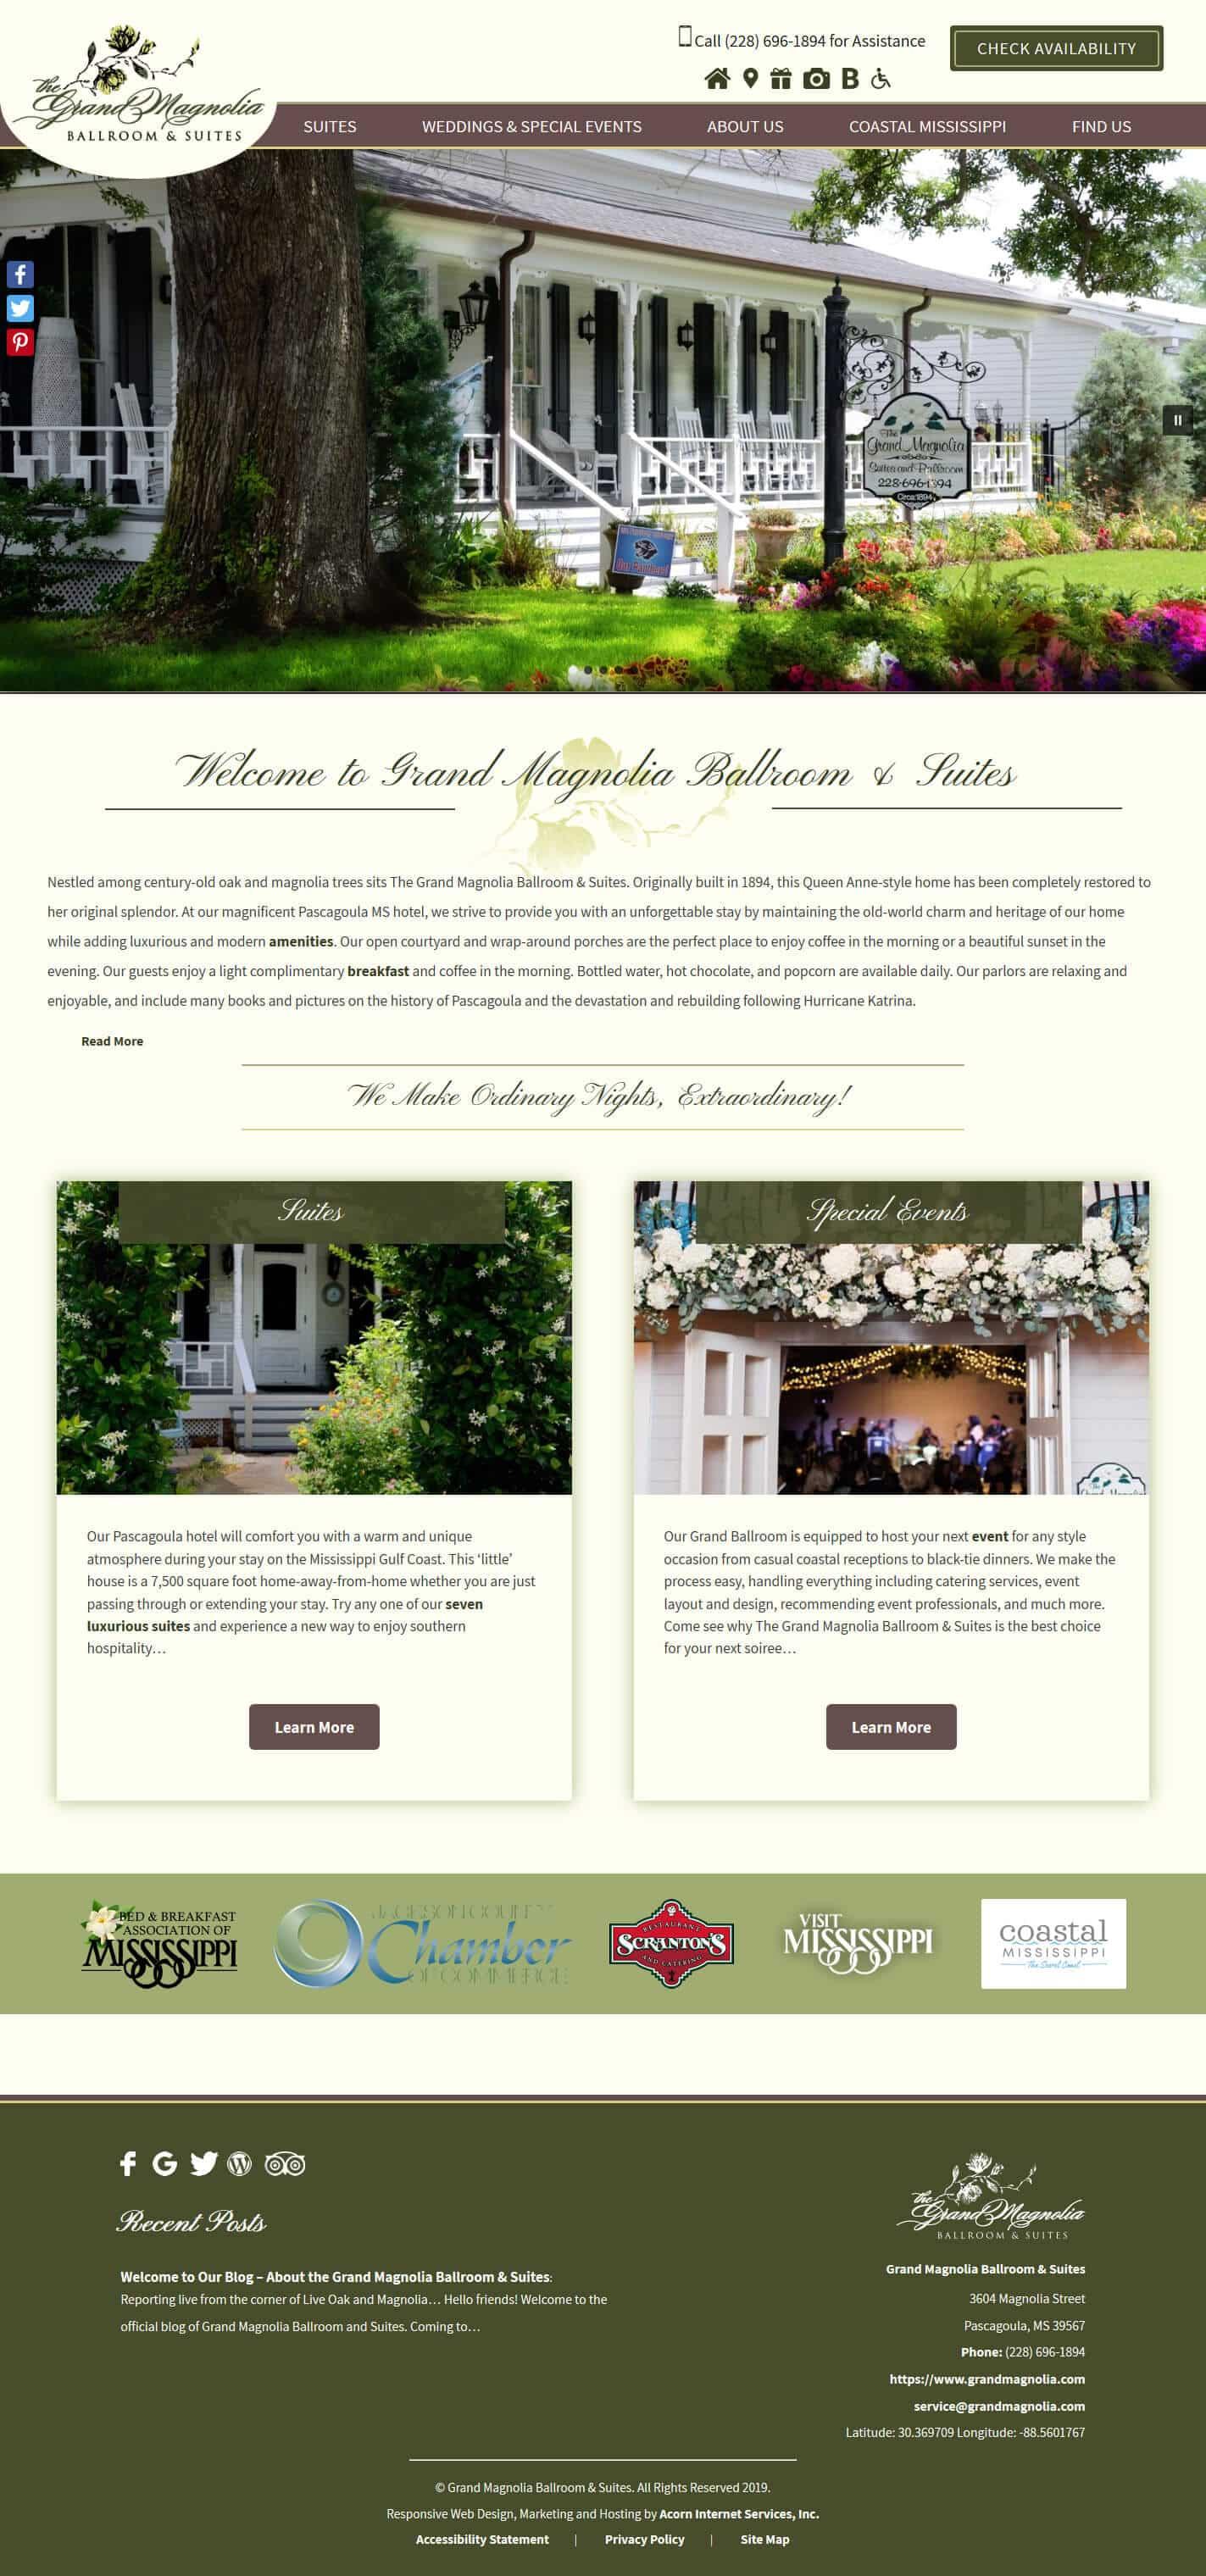 Grand Magnolia Ballroom & Suites website home page